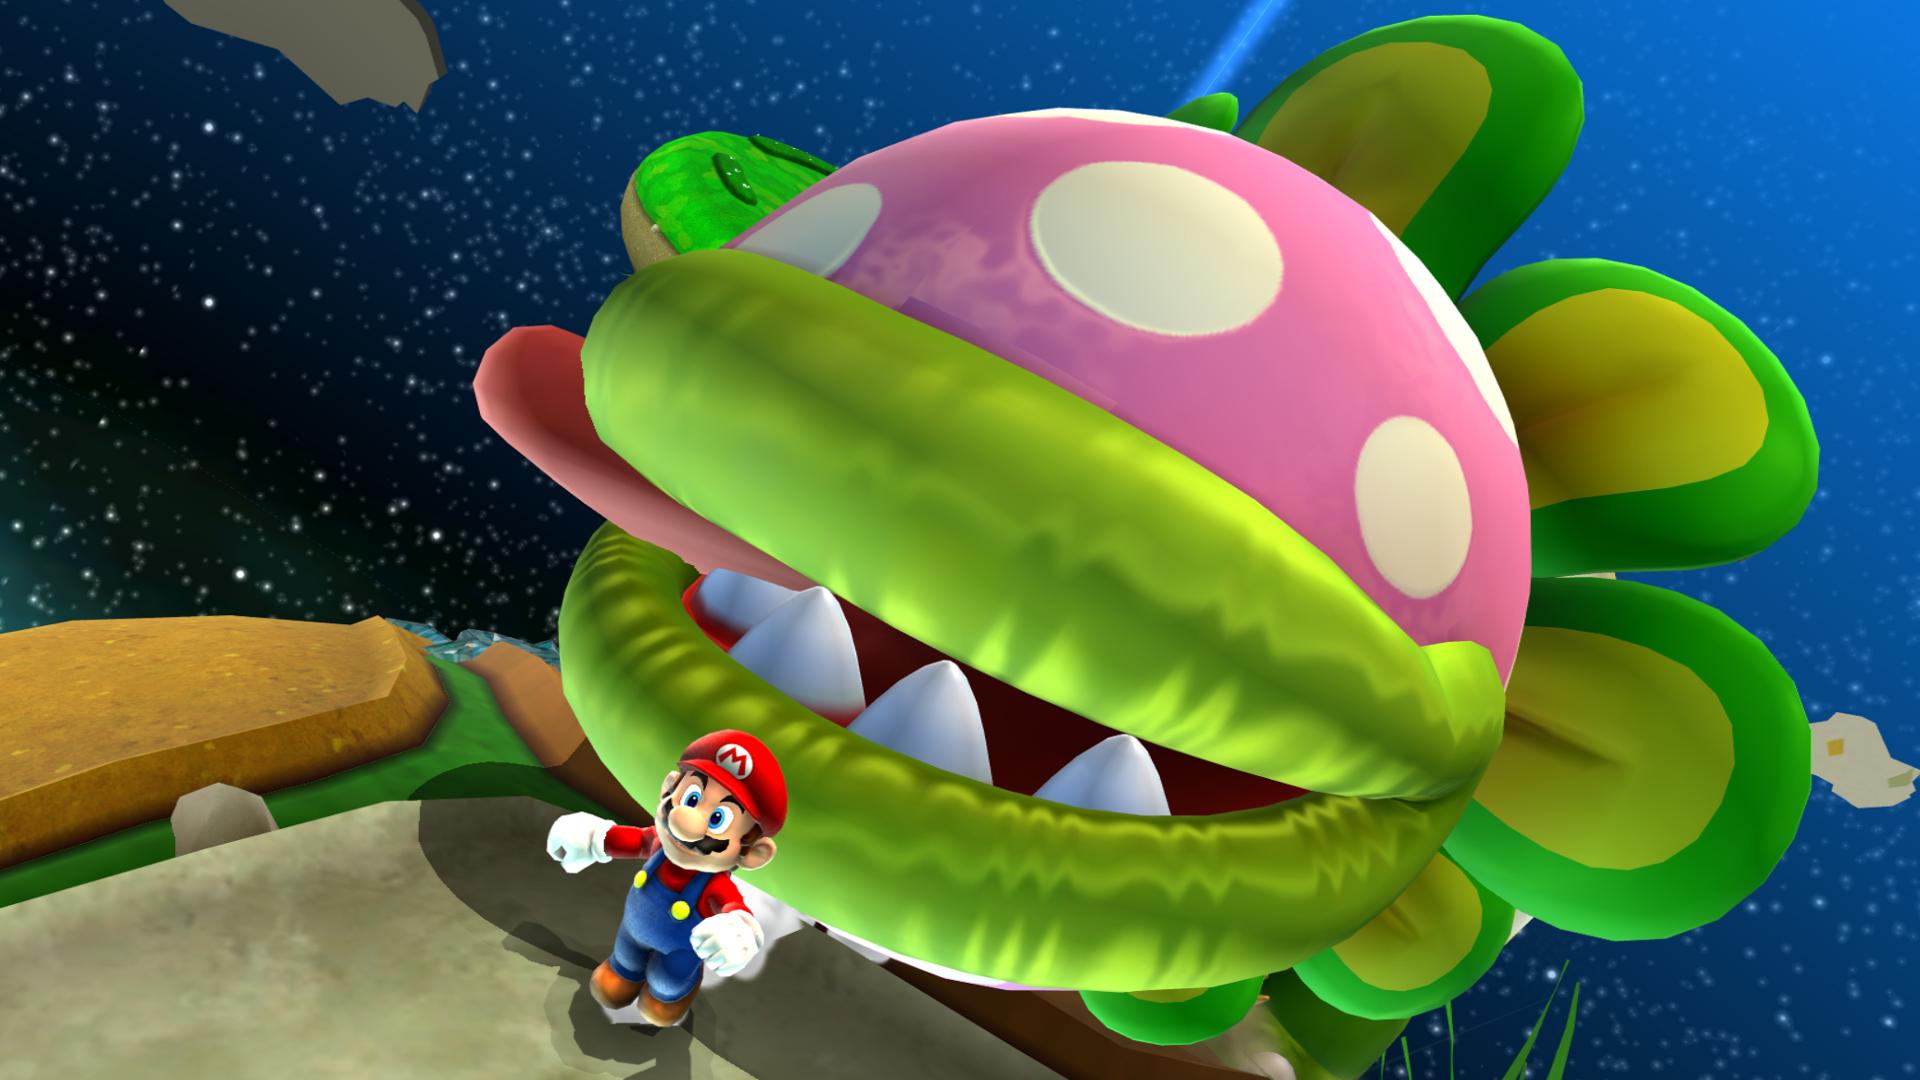 50+] Super Mario Galaxy 2 Wallpaper Hd on WallpaperSafari